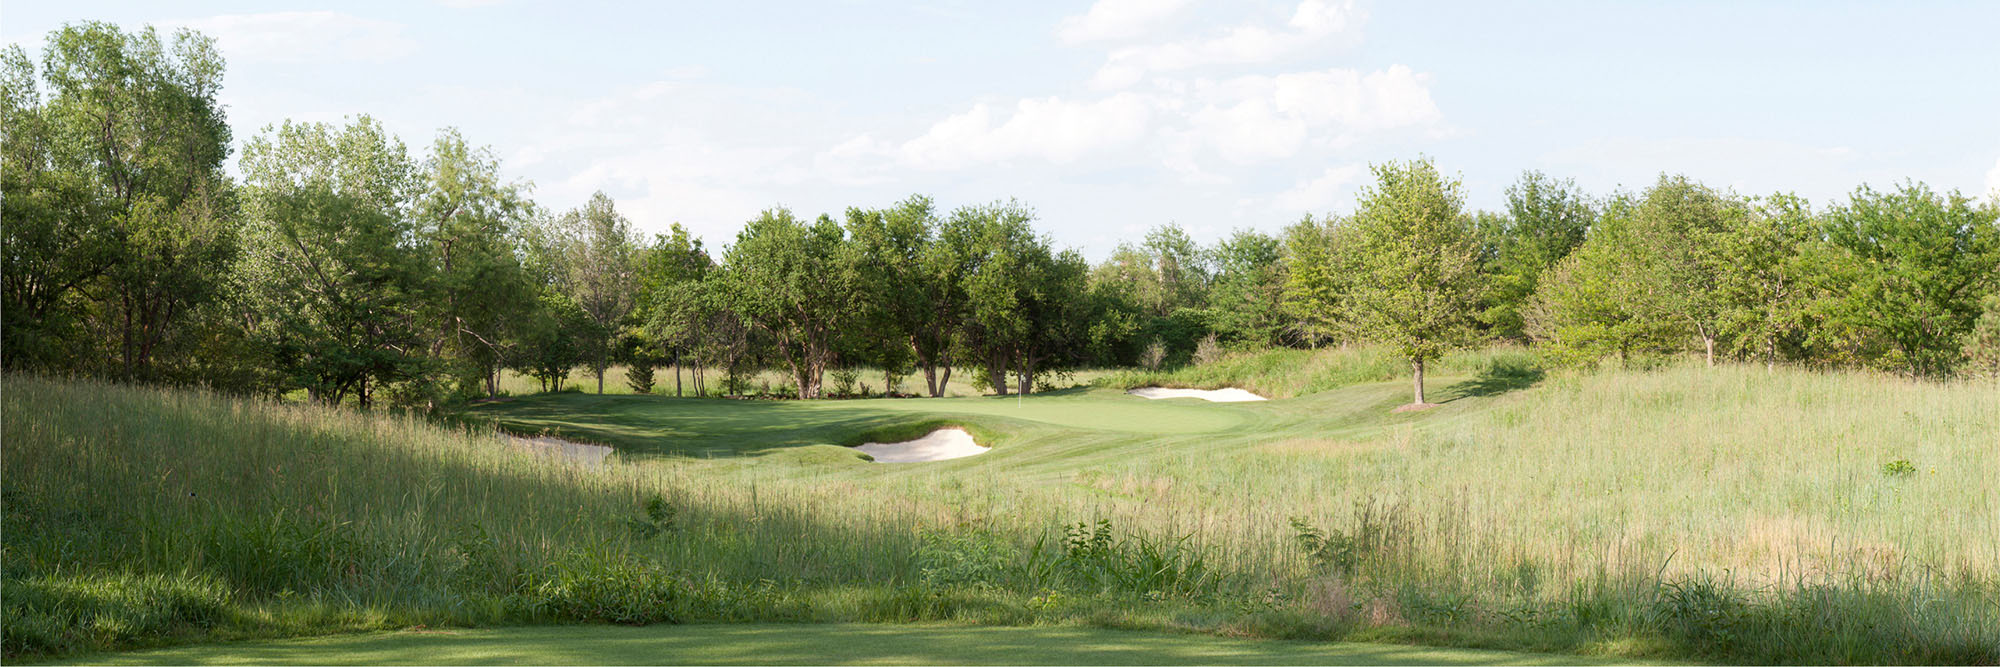 Golf Course Image - Flint Hills National Golf Club No.14